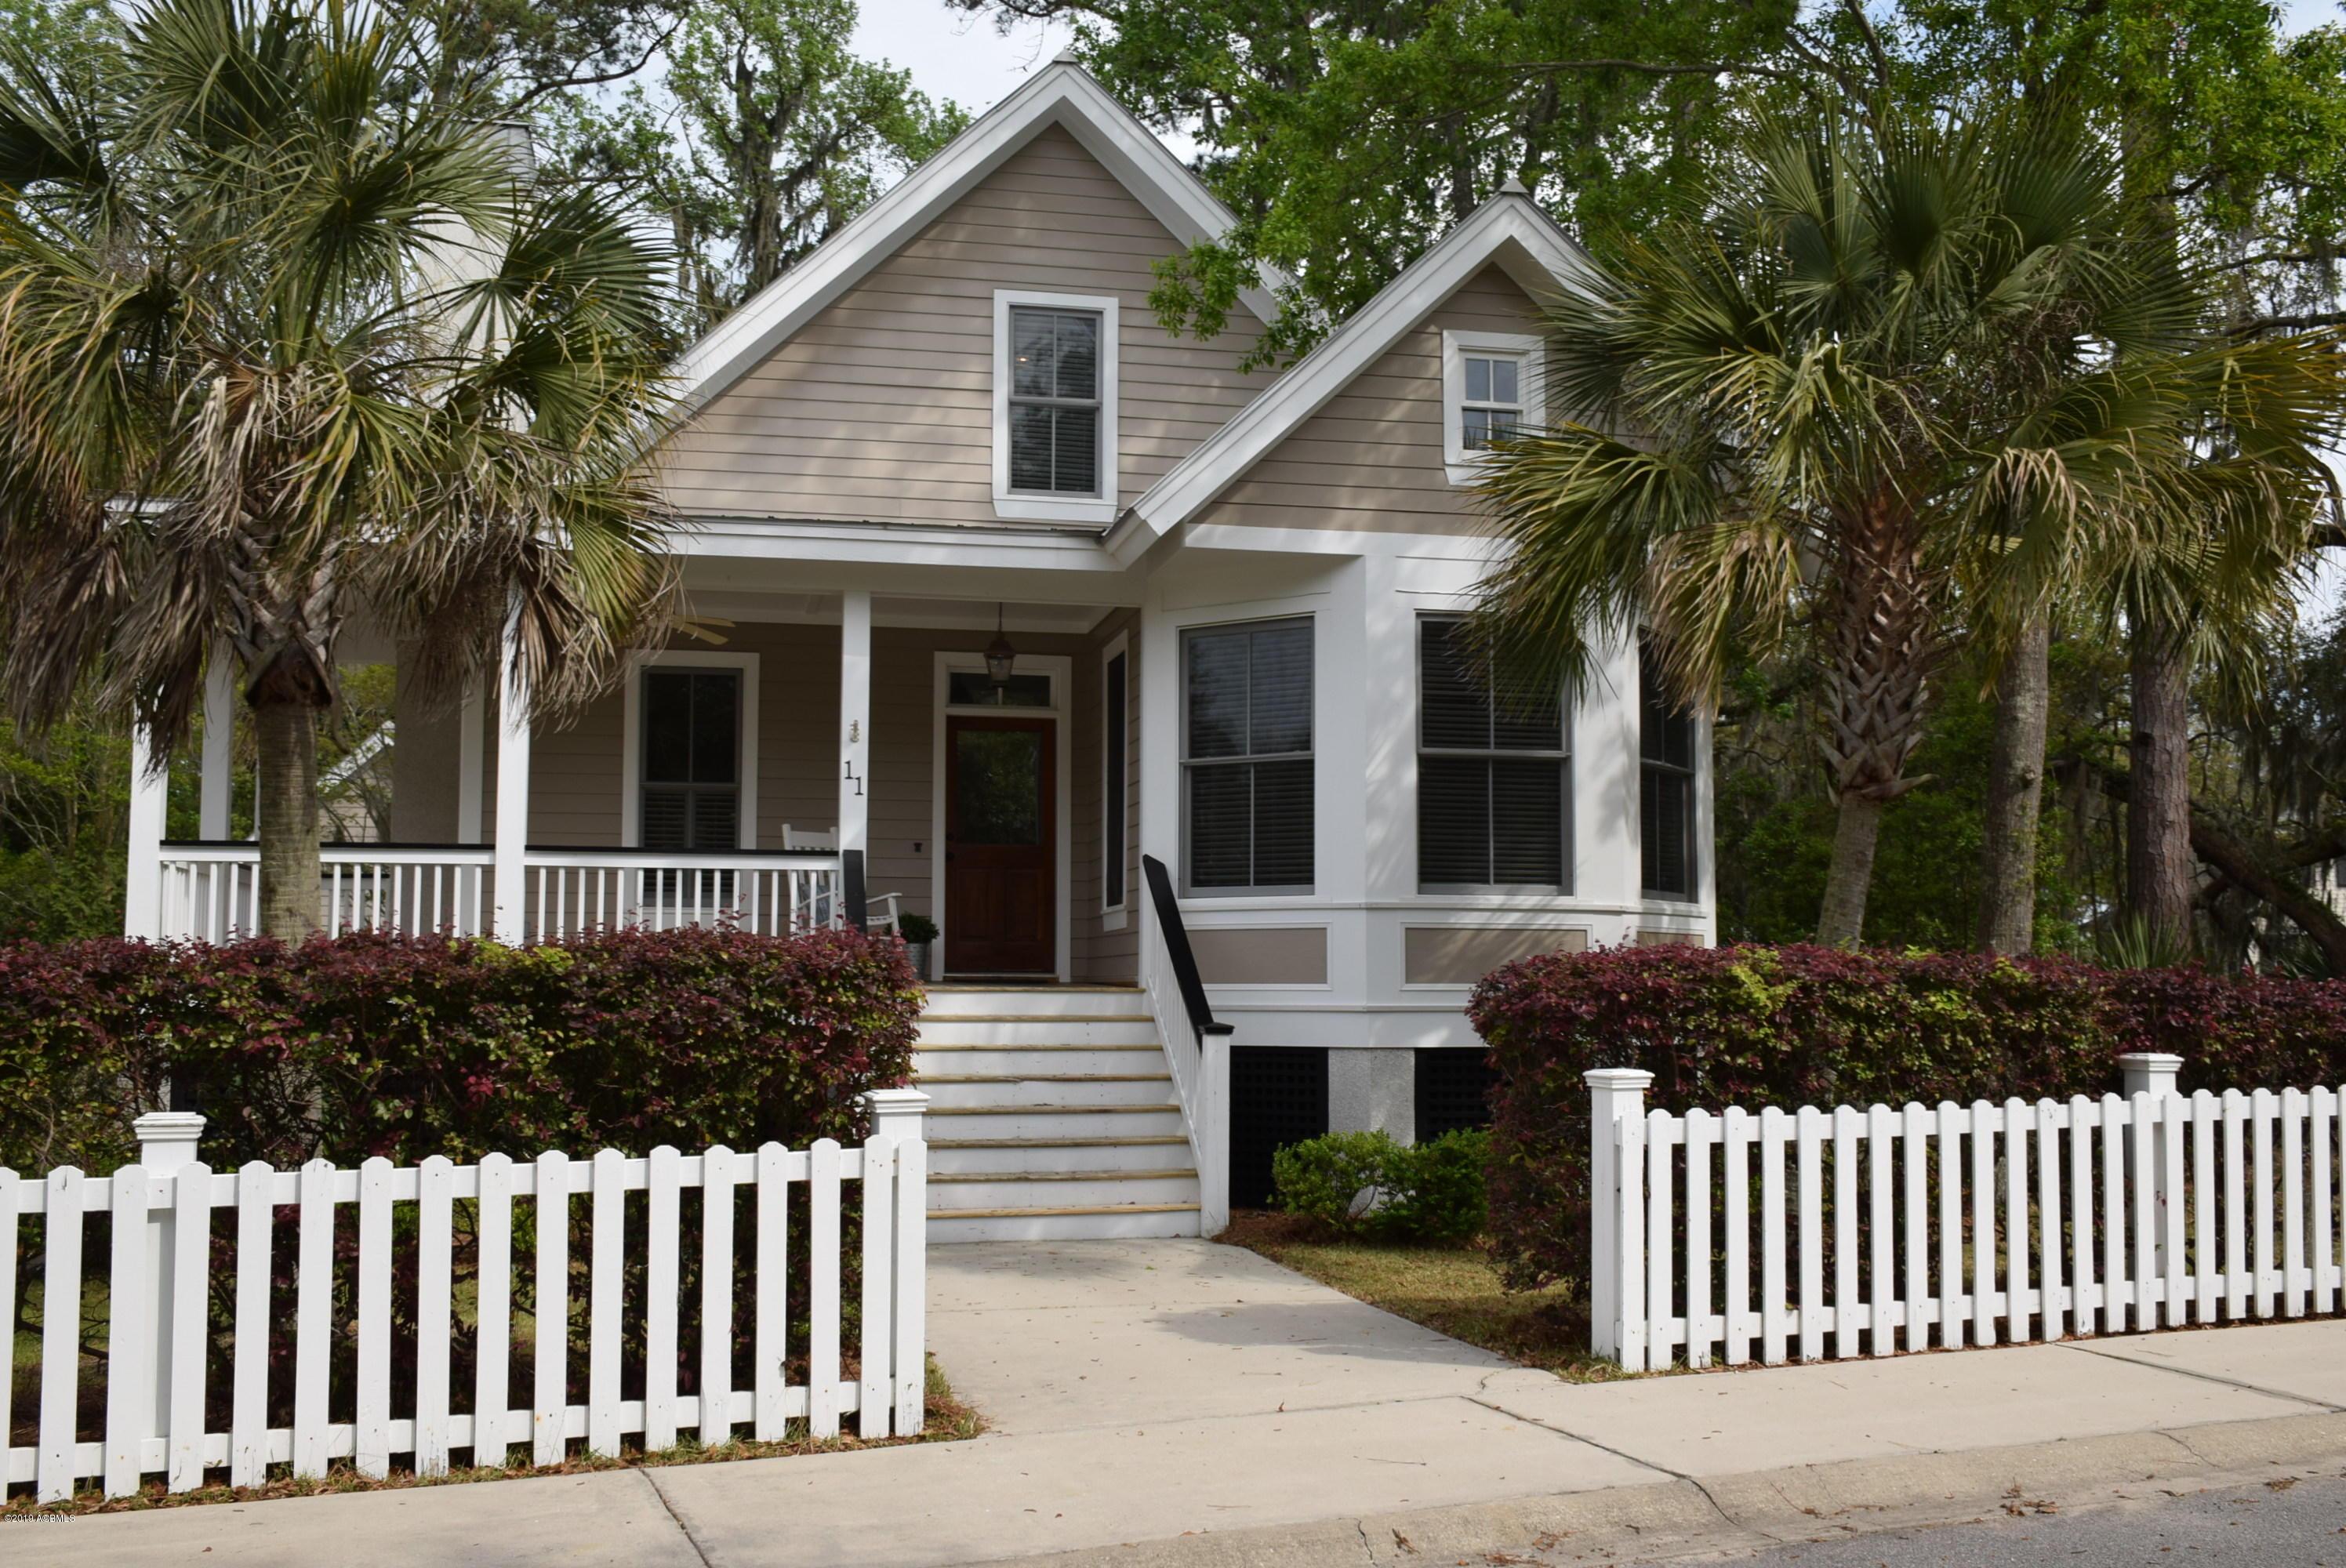 6 jade street beaufort 29907 weichert realtors coastal properties rh karenryanrealtor com